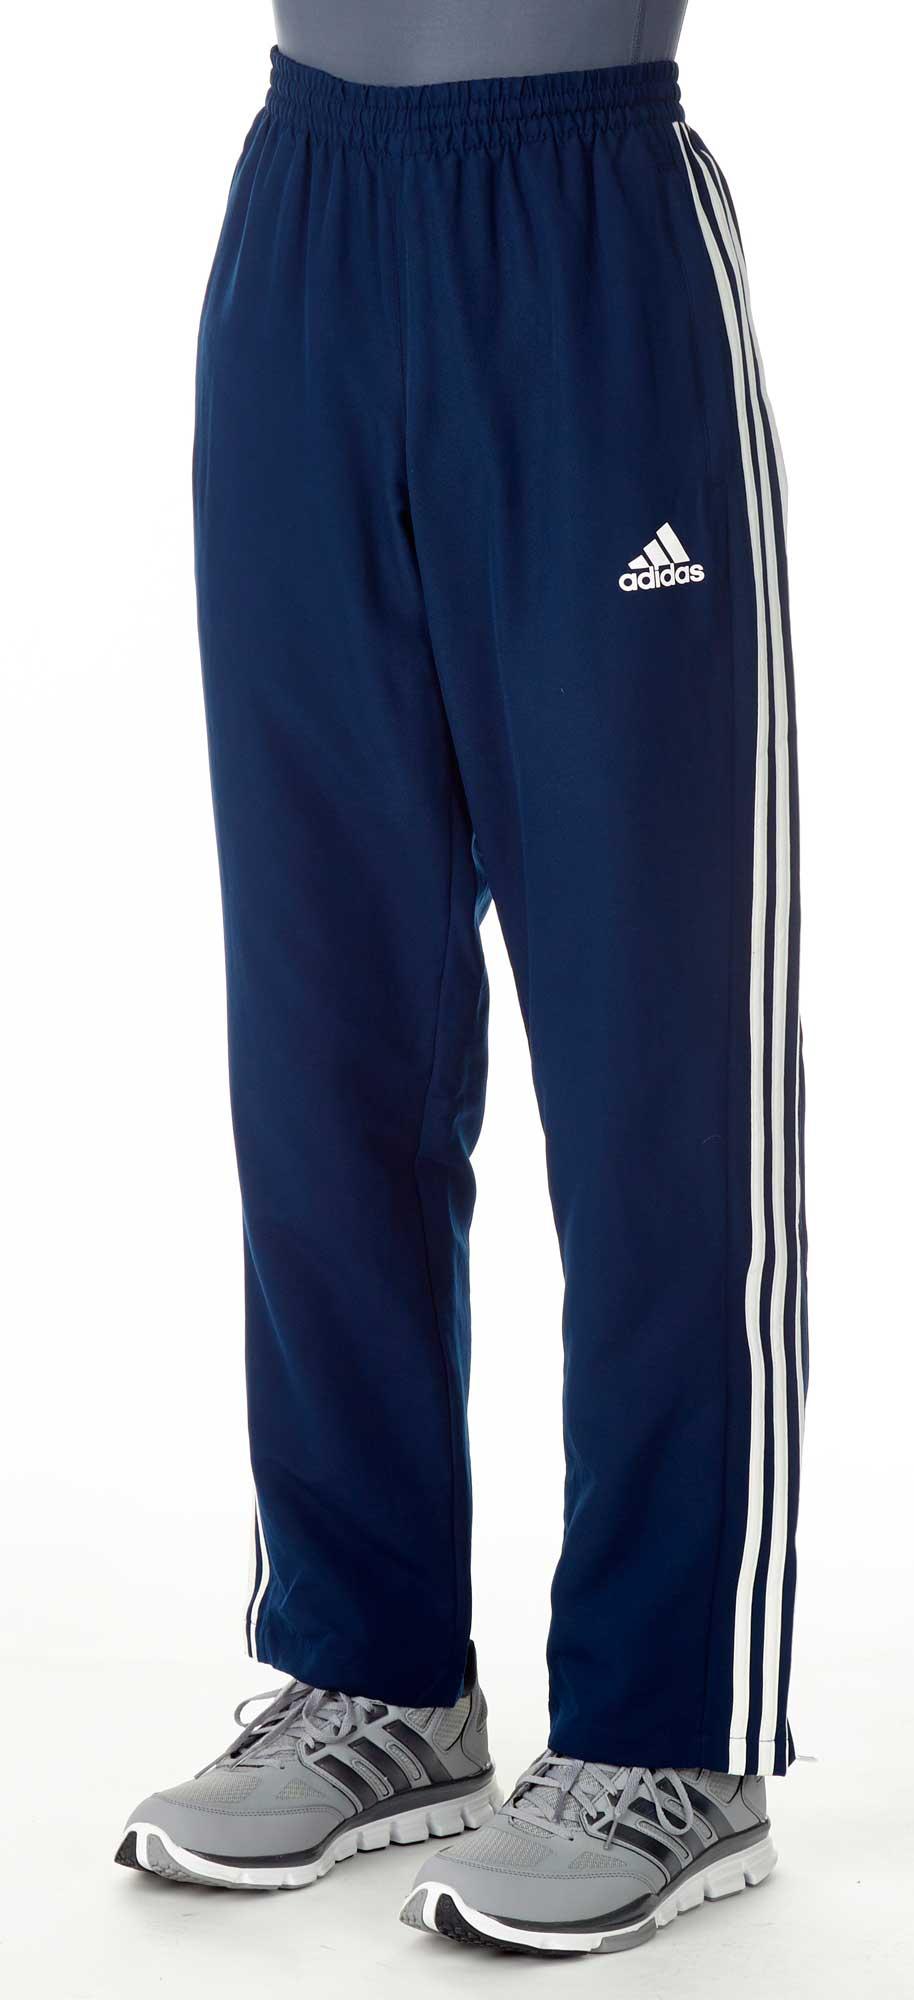 adidas T16 Team Hose Männer navy blau weiß, AJ5319